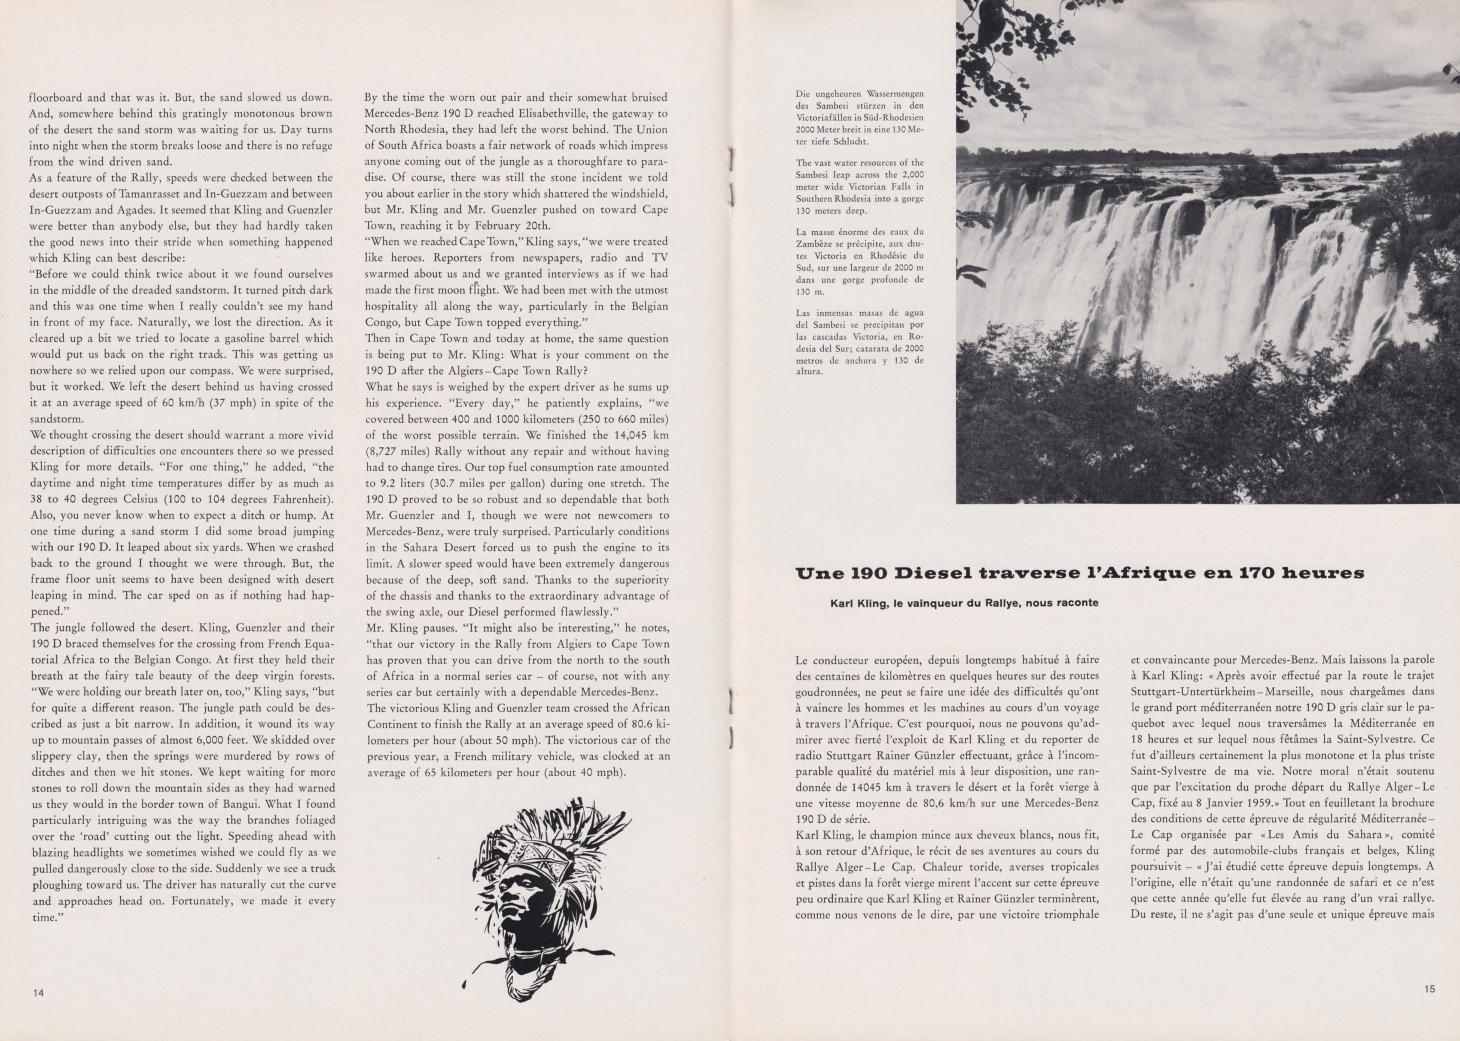 (REVISTA): Periódico In aller welt n.º 31 - Mercedes-Benz no mundo - 1959 - multilingue 008